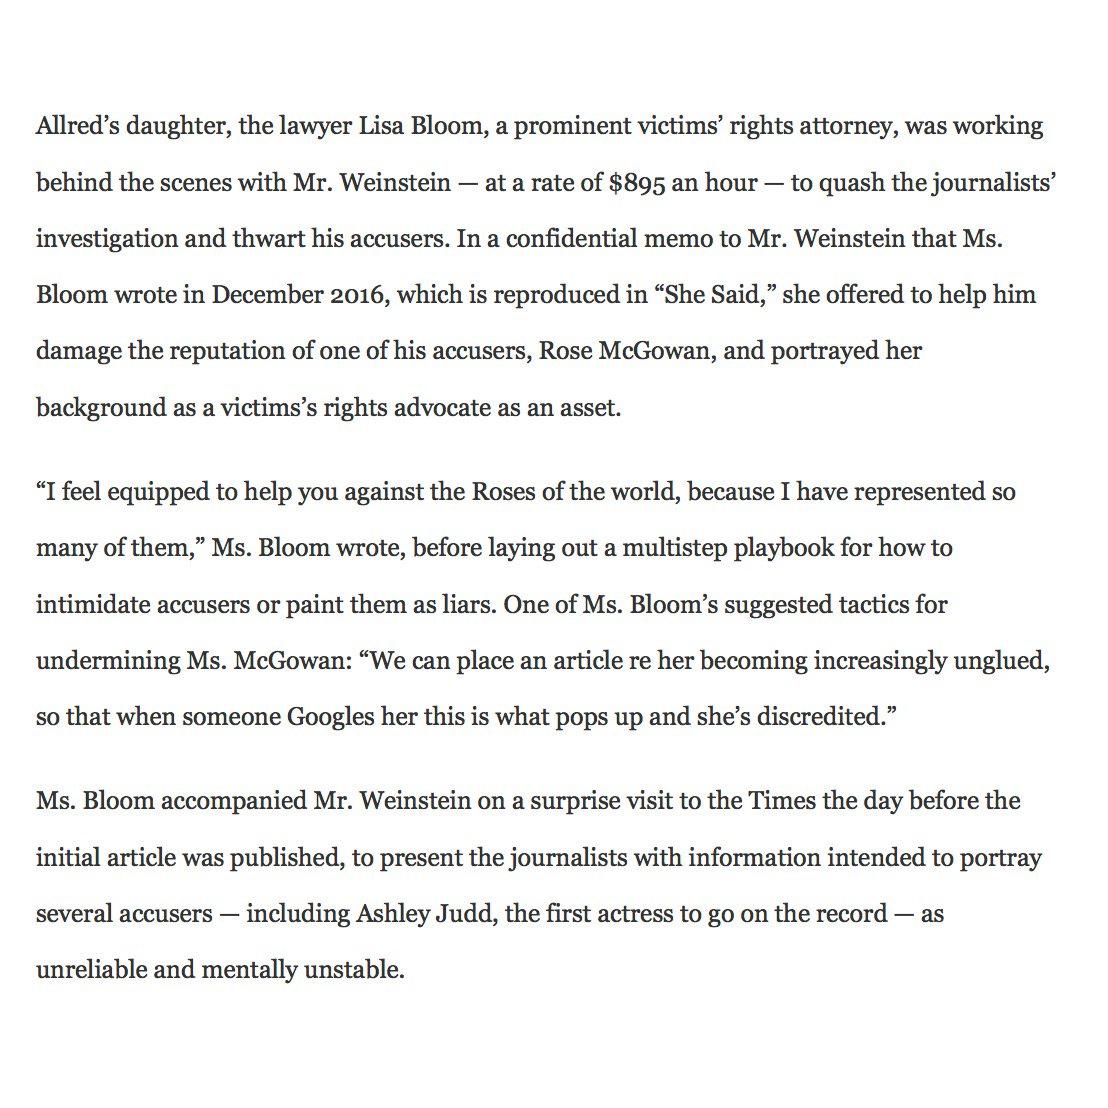 Feminist Attorney Lisa Bloom Offered To Help Harvey Weinstein Smear Accusers, New Book Alleges